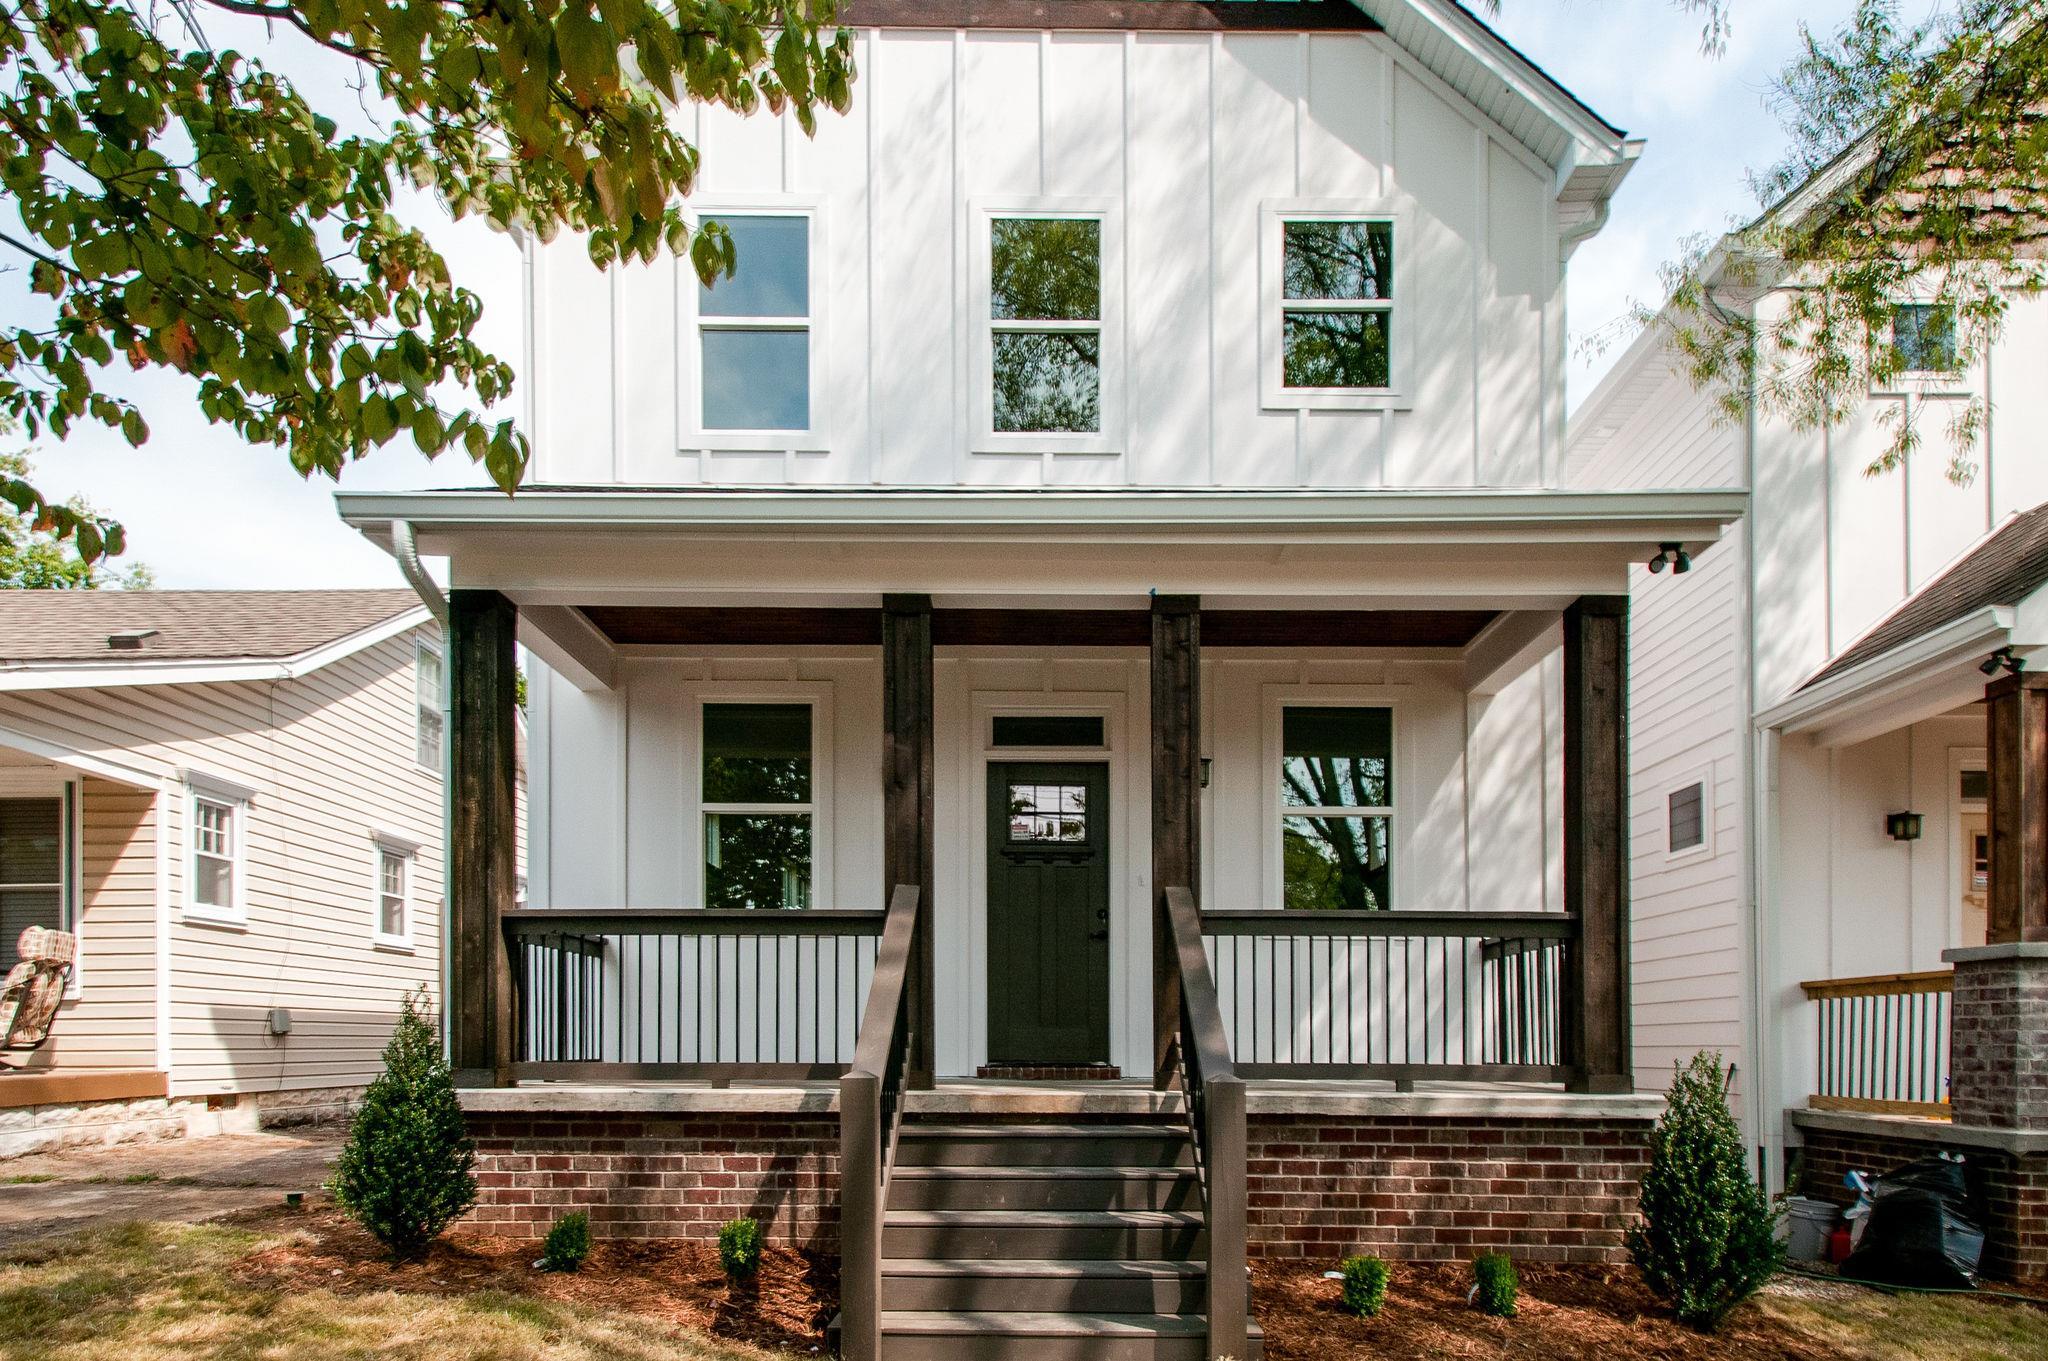 1203 B N 5Th St, Nashville, TN 37207 - Nashville, TN real estate listing